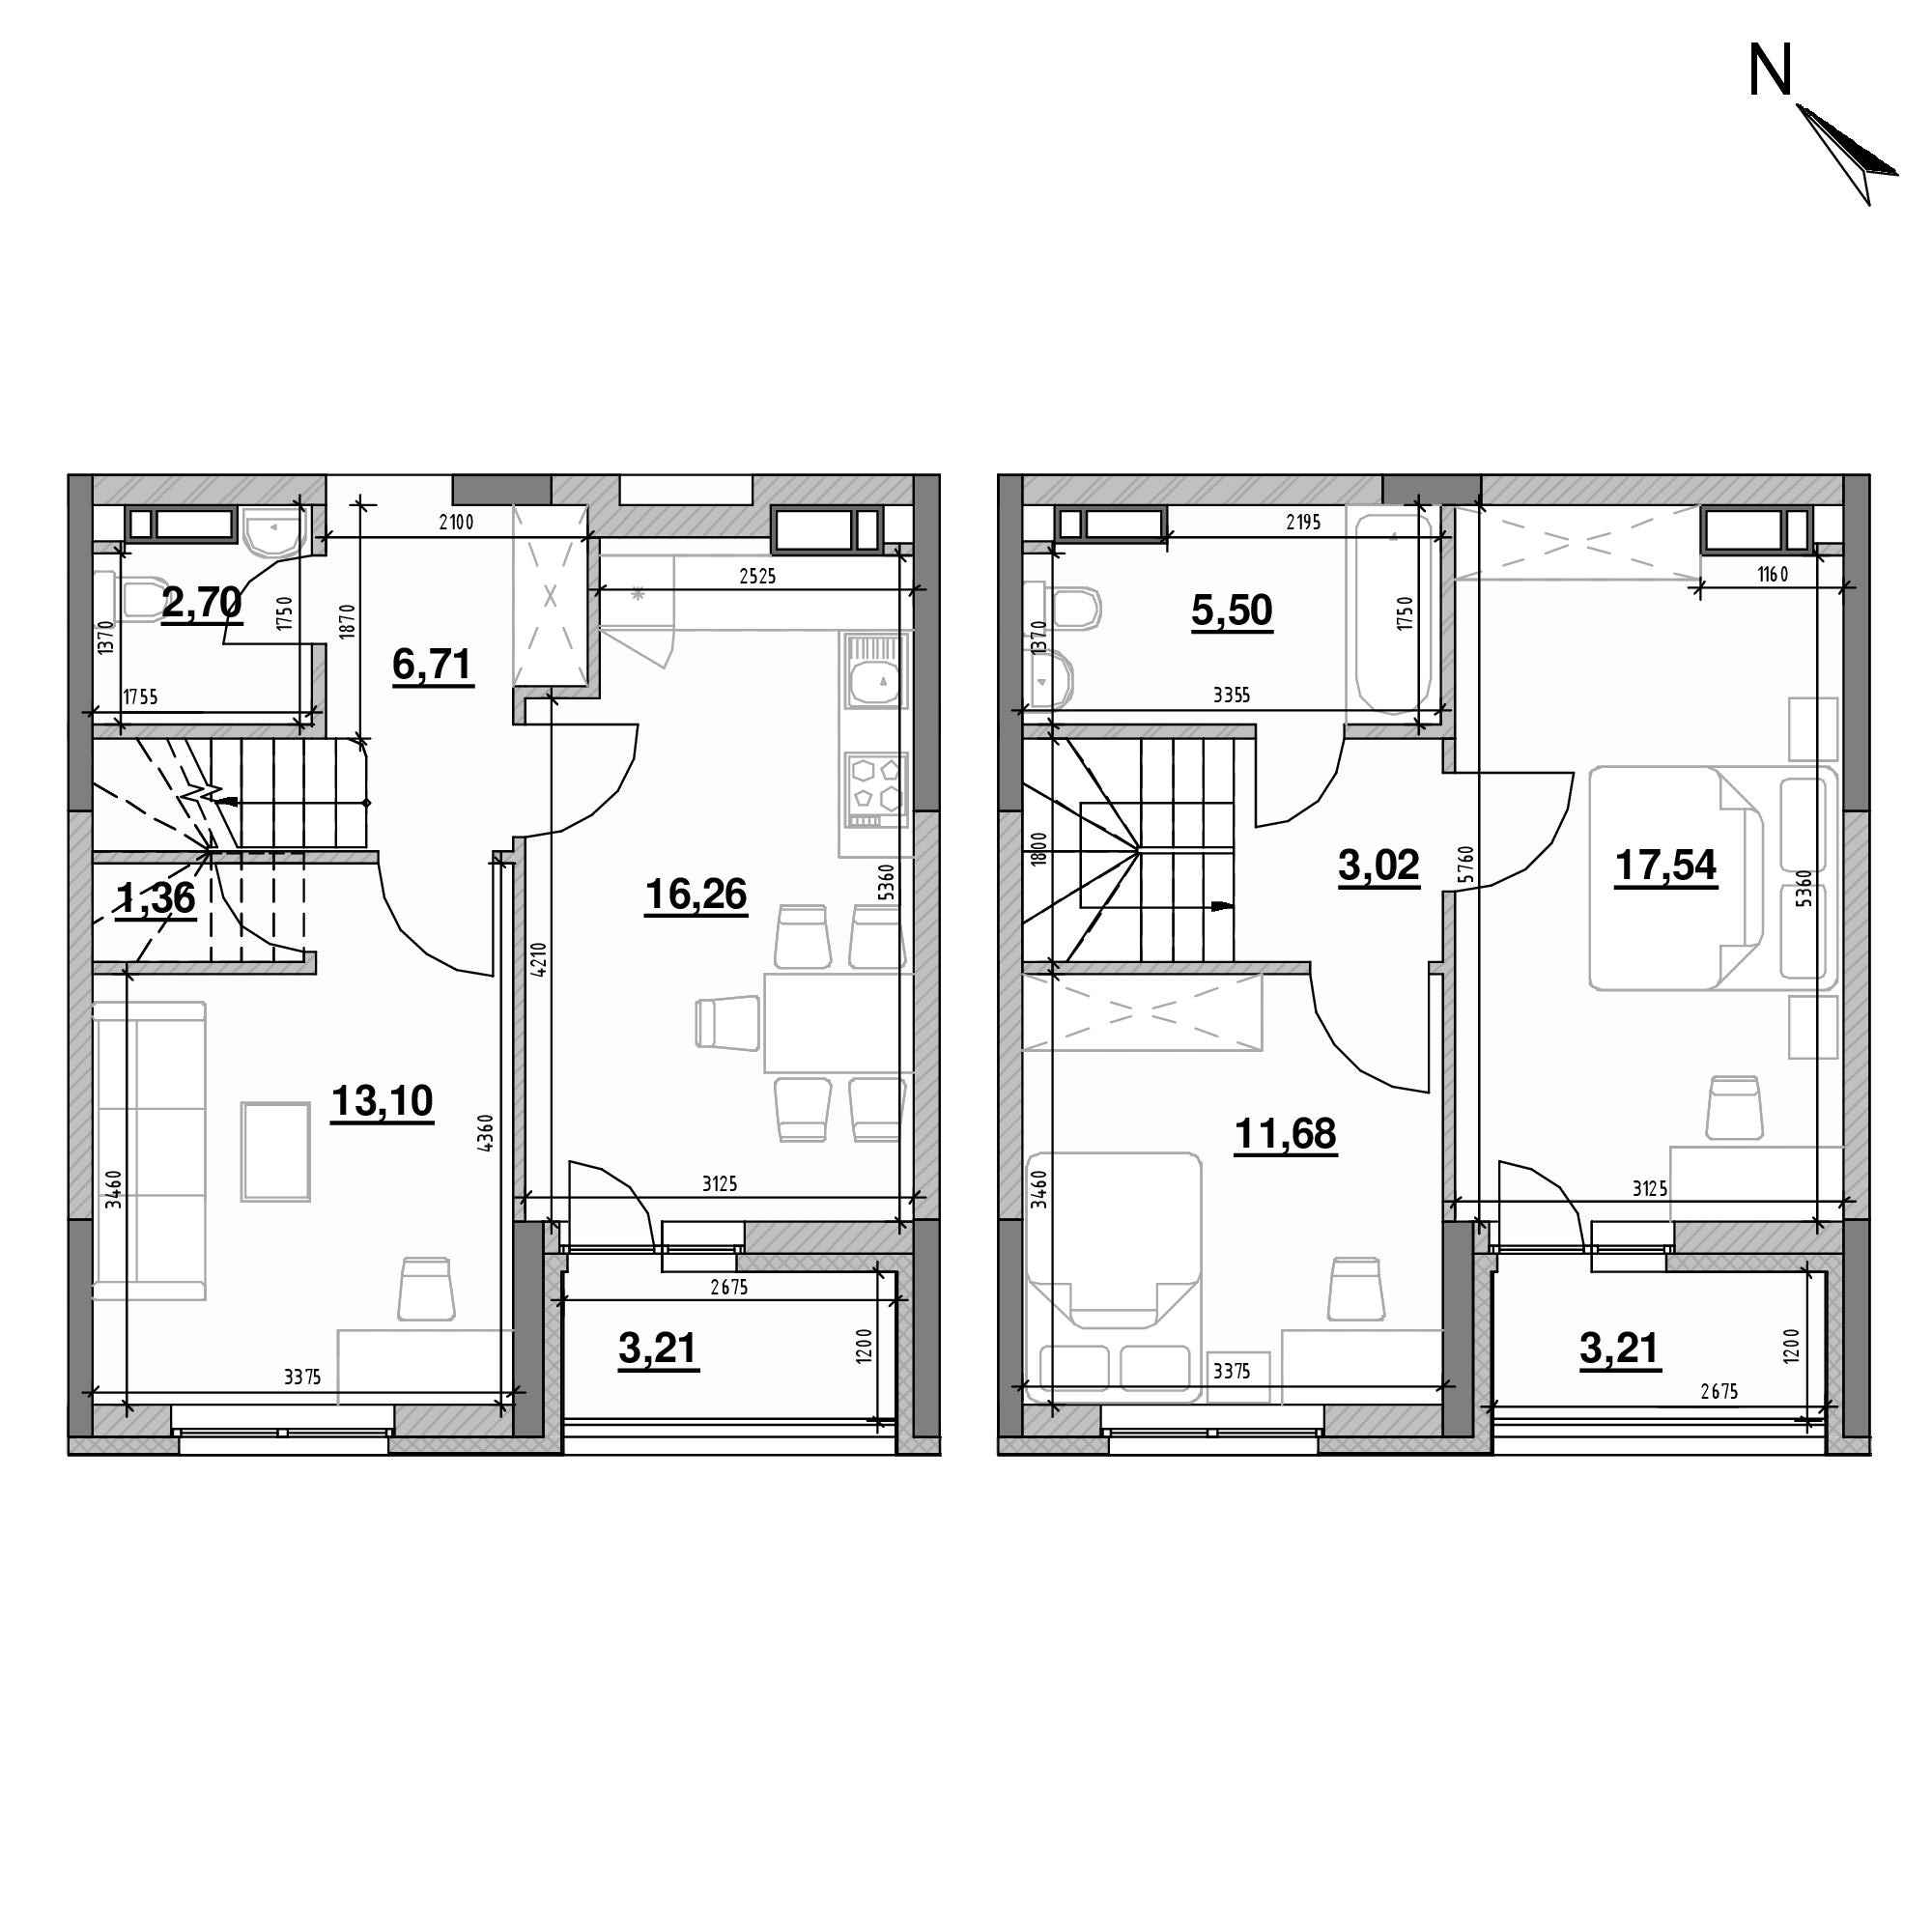 ЖК Оk'Land: планування 3-кімнатної квартири, №108, 84.29 м<sup>2</sup>